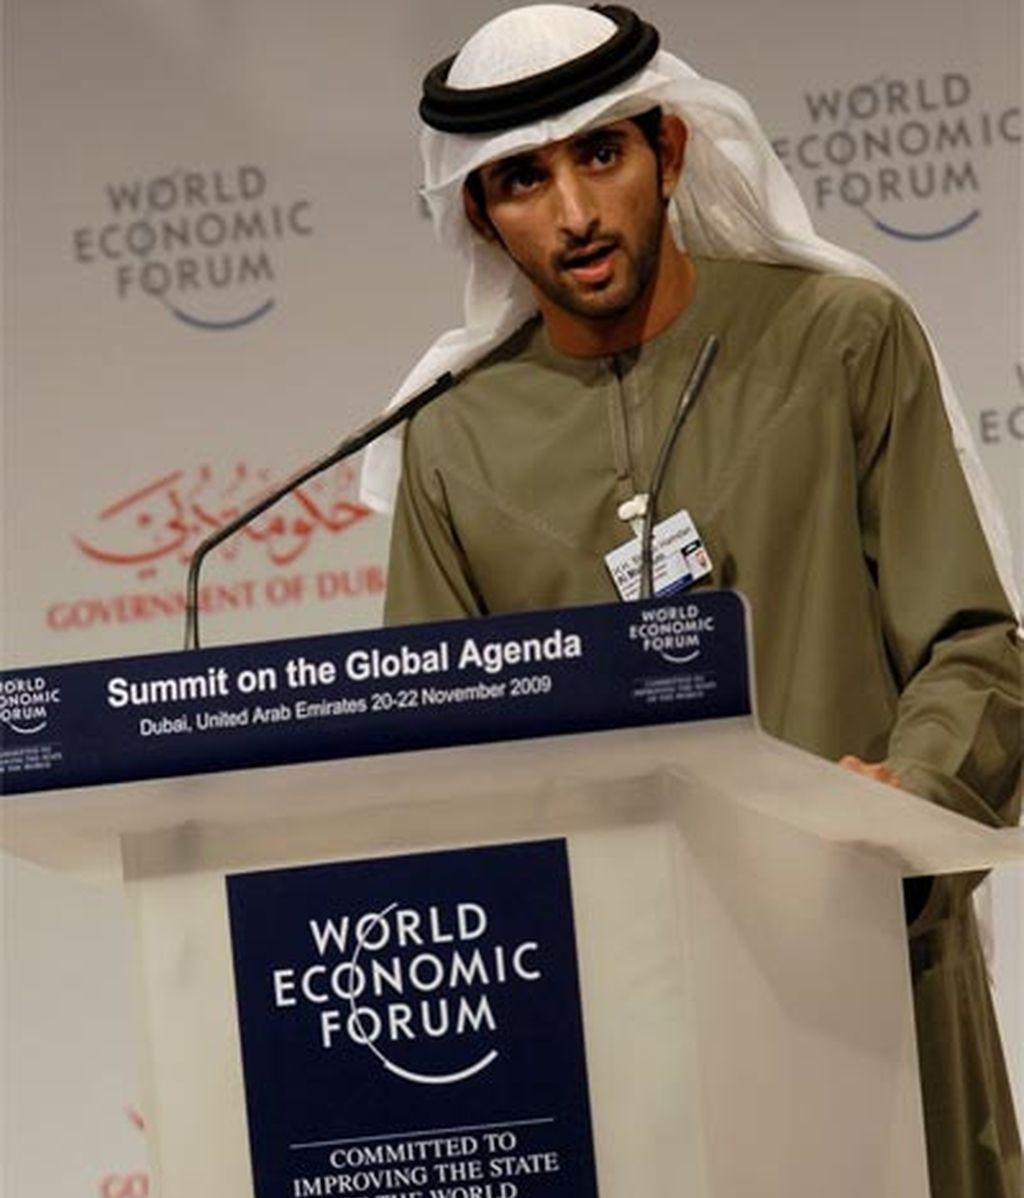 Sheikh Hamdan bin Mohammed bin Rashid al Maktoum, príncipe de Dubai